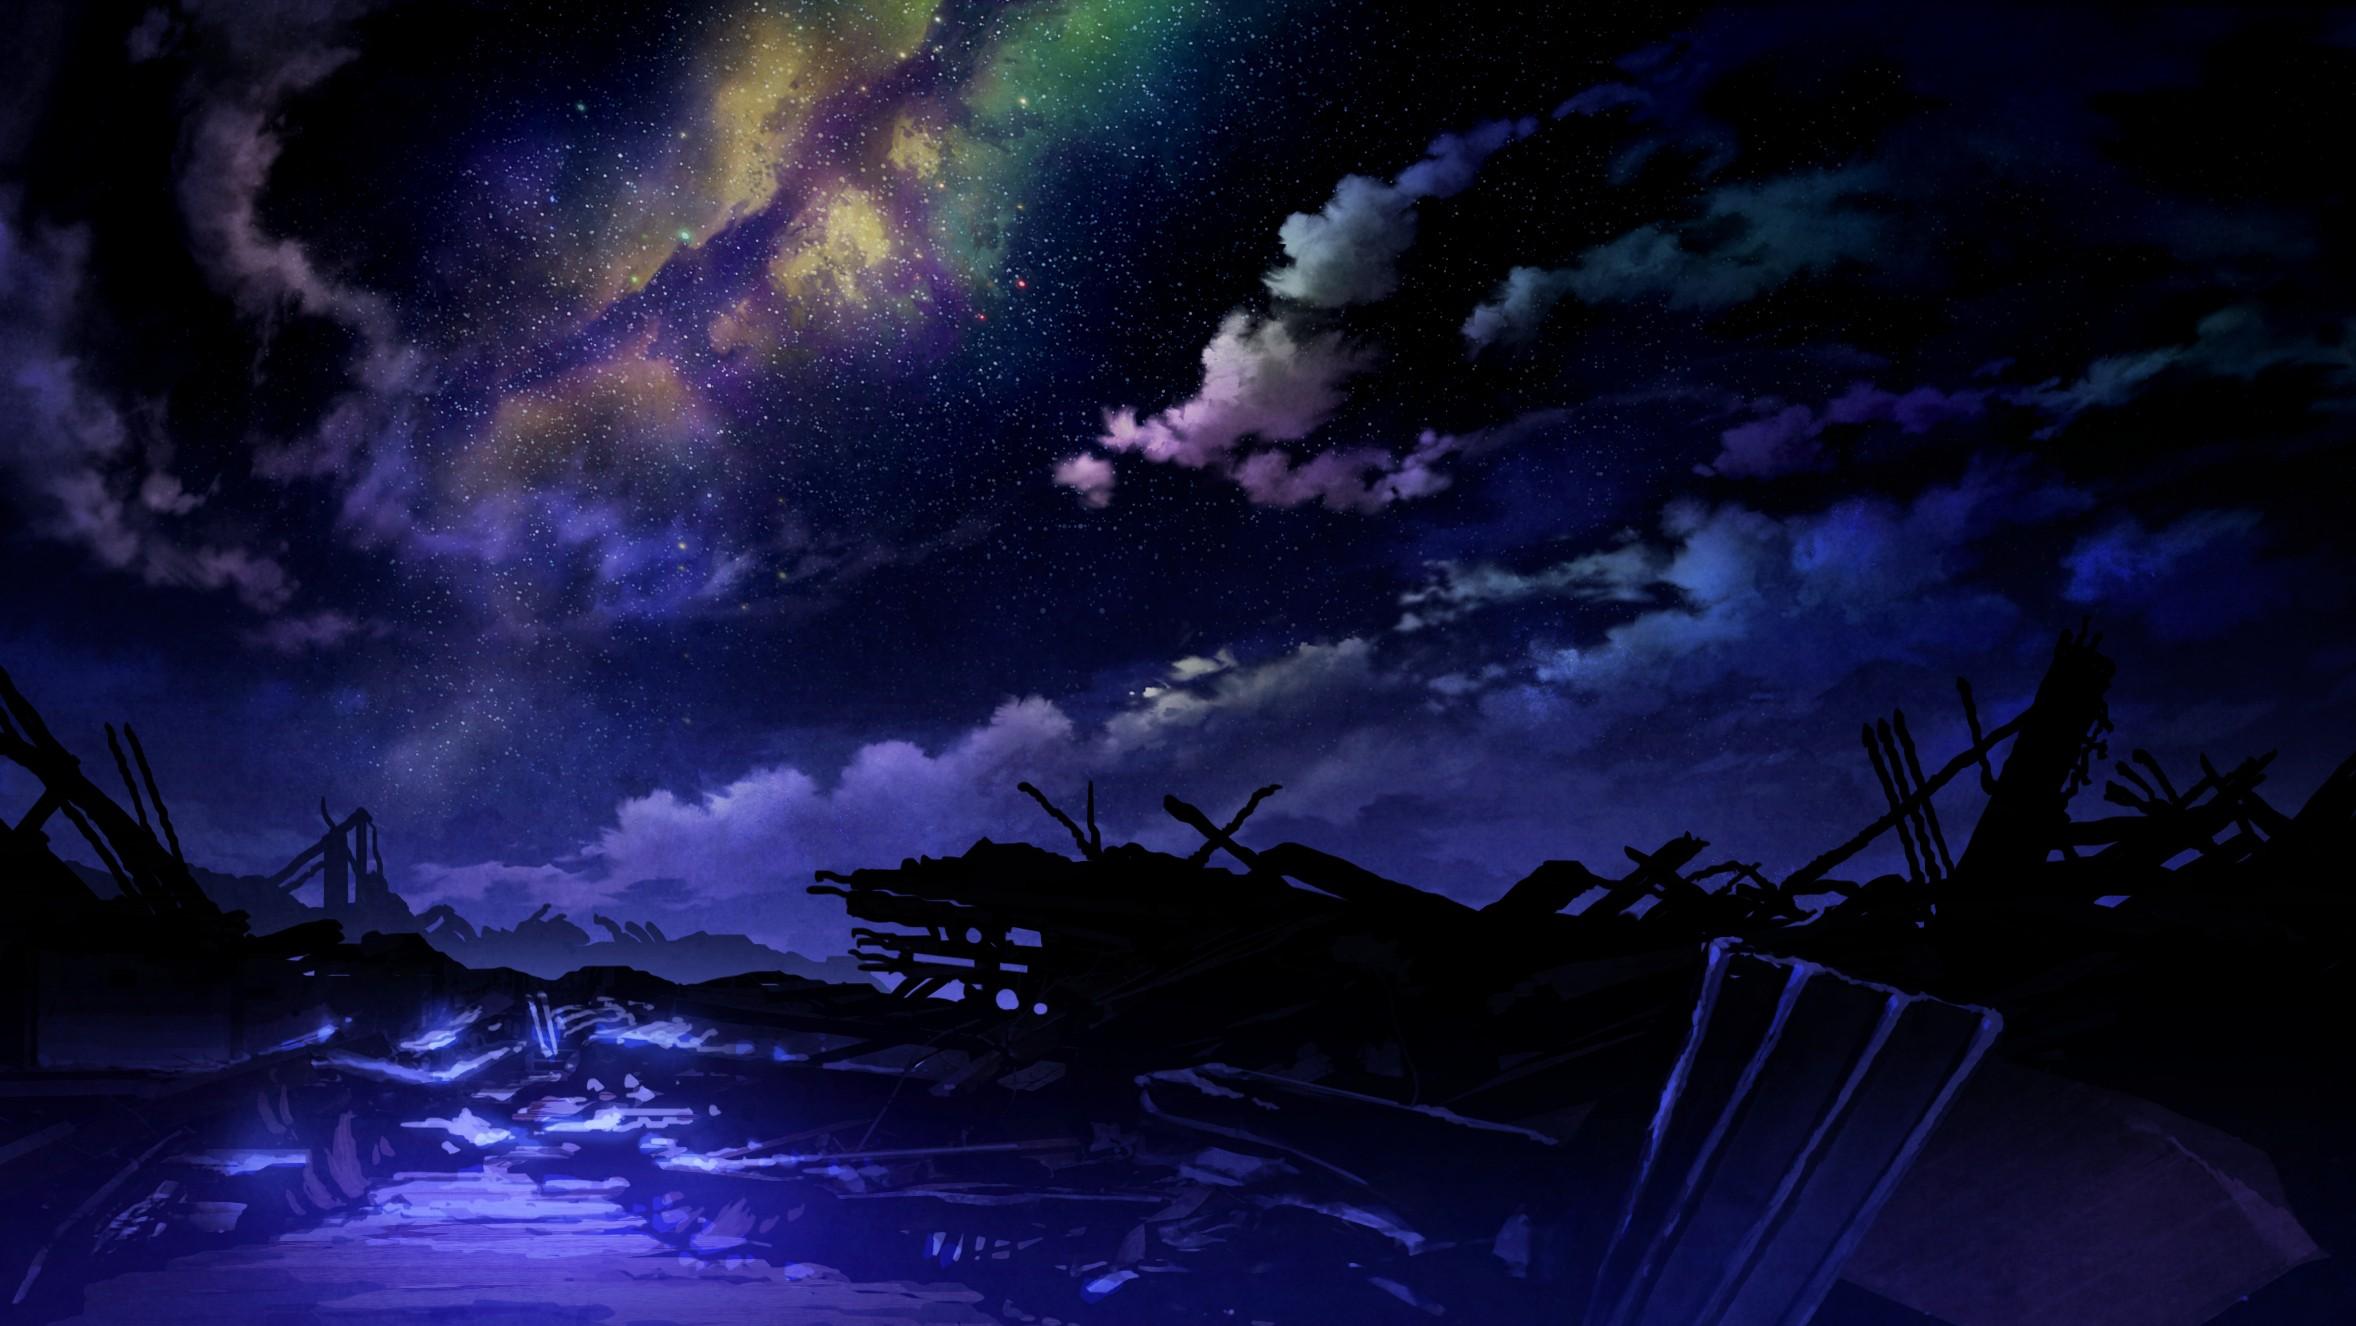 Wallpaper : Fantasy Art, Night, Anime, Apocalyptic, Ruin